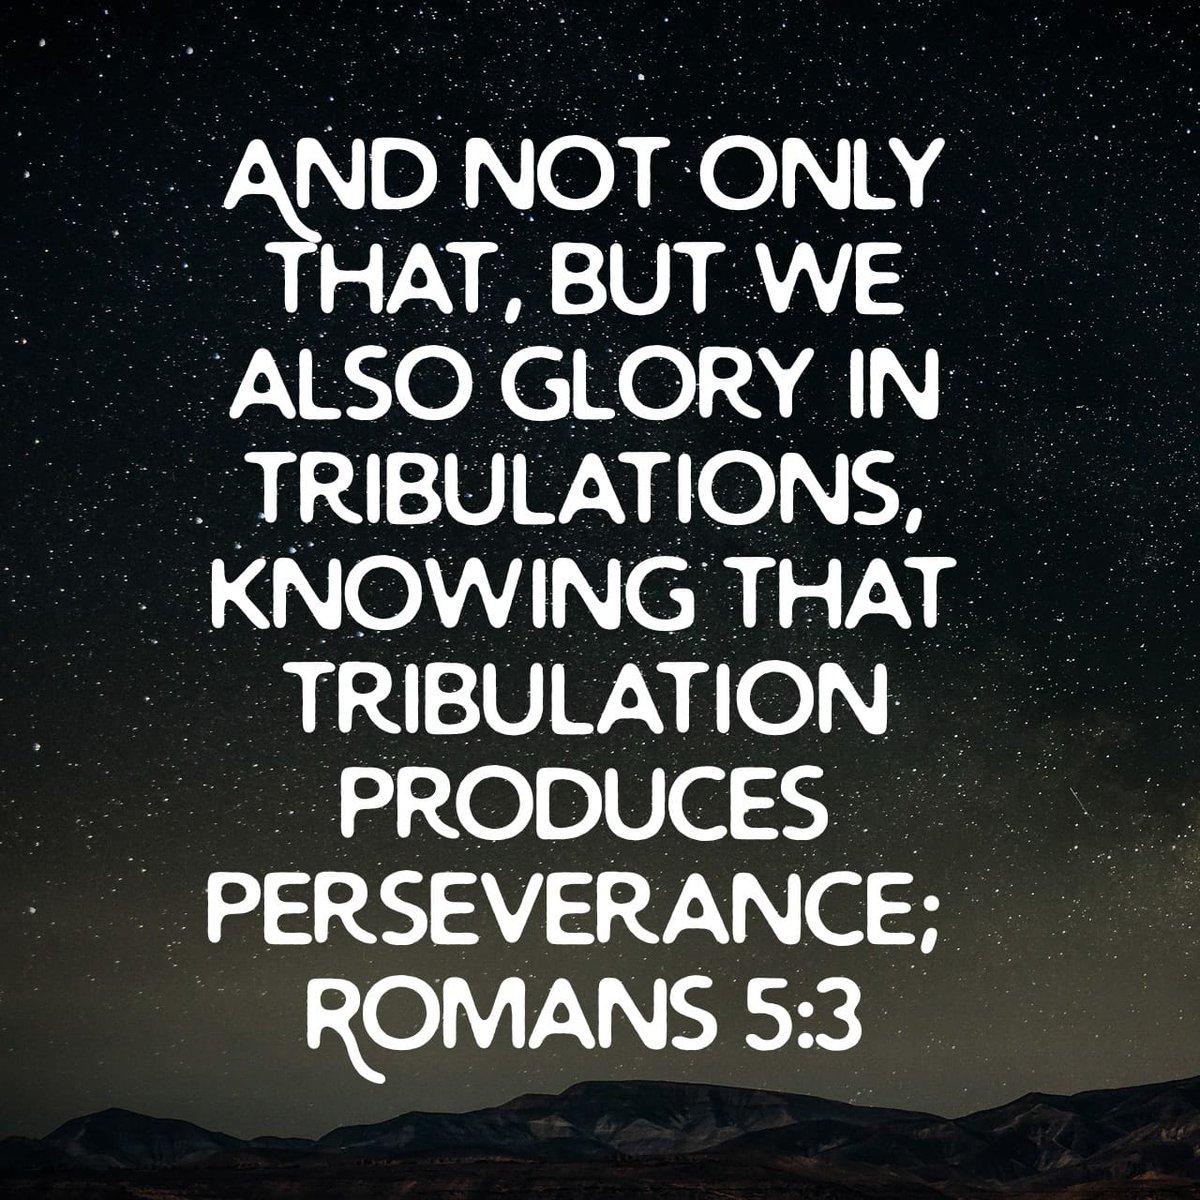 #Tribulation #Perserverance